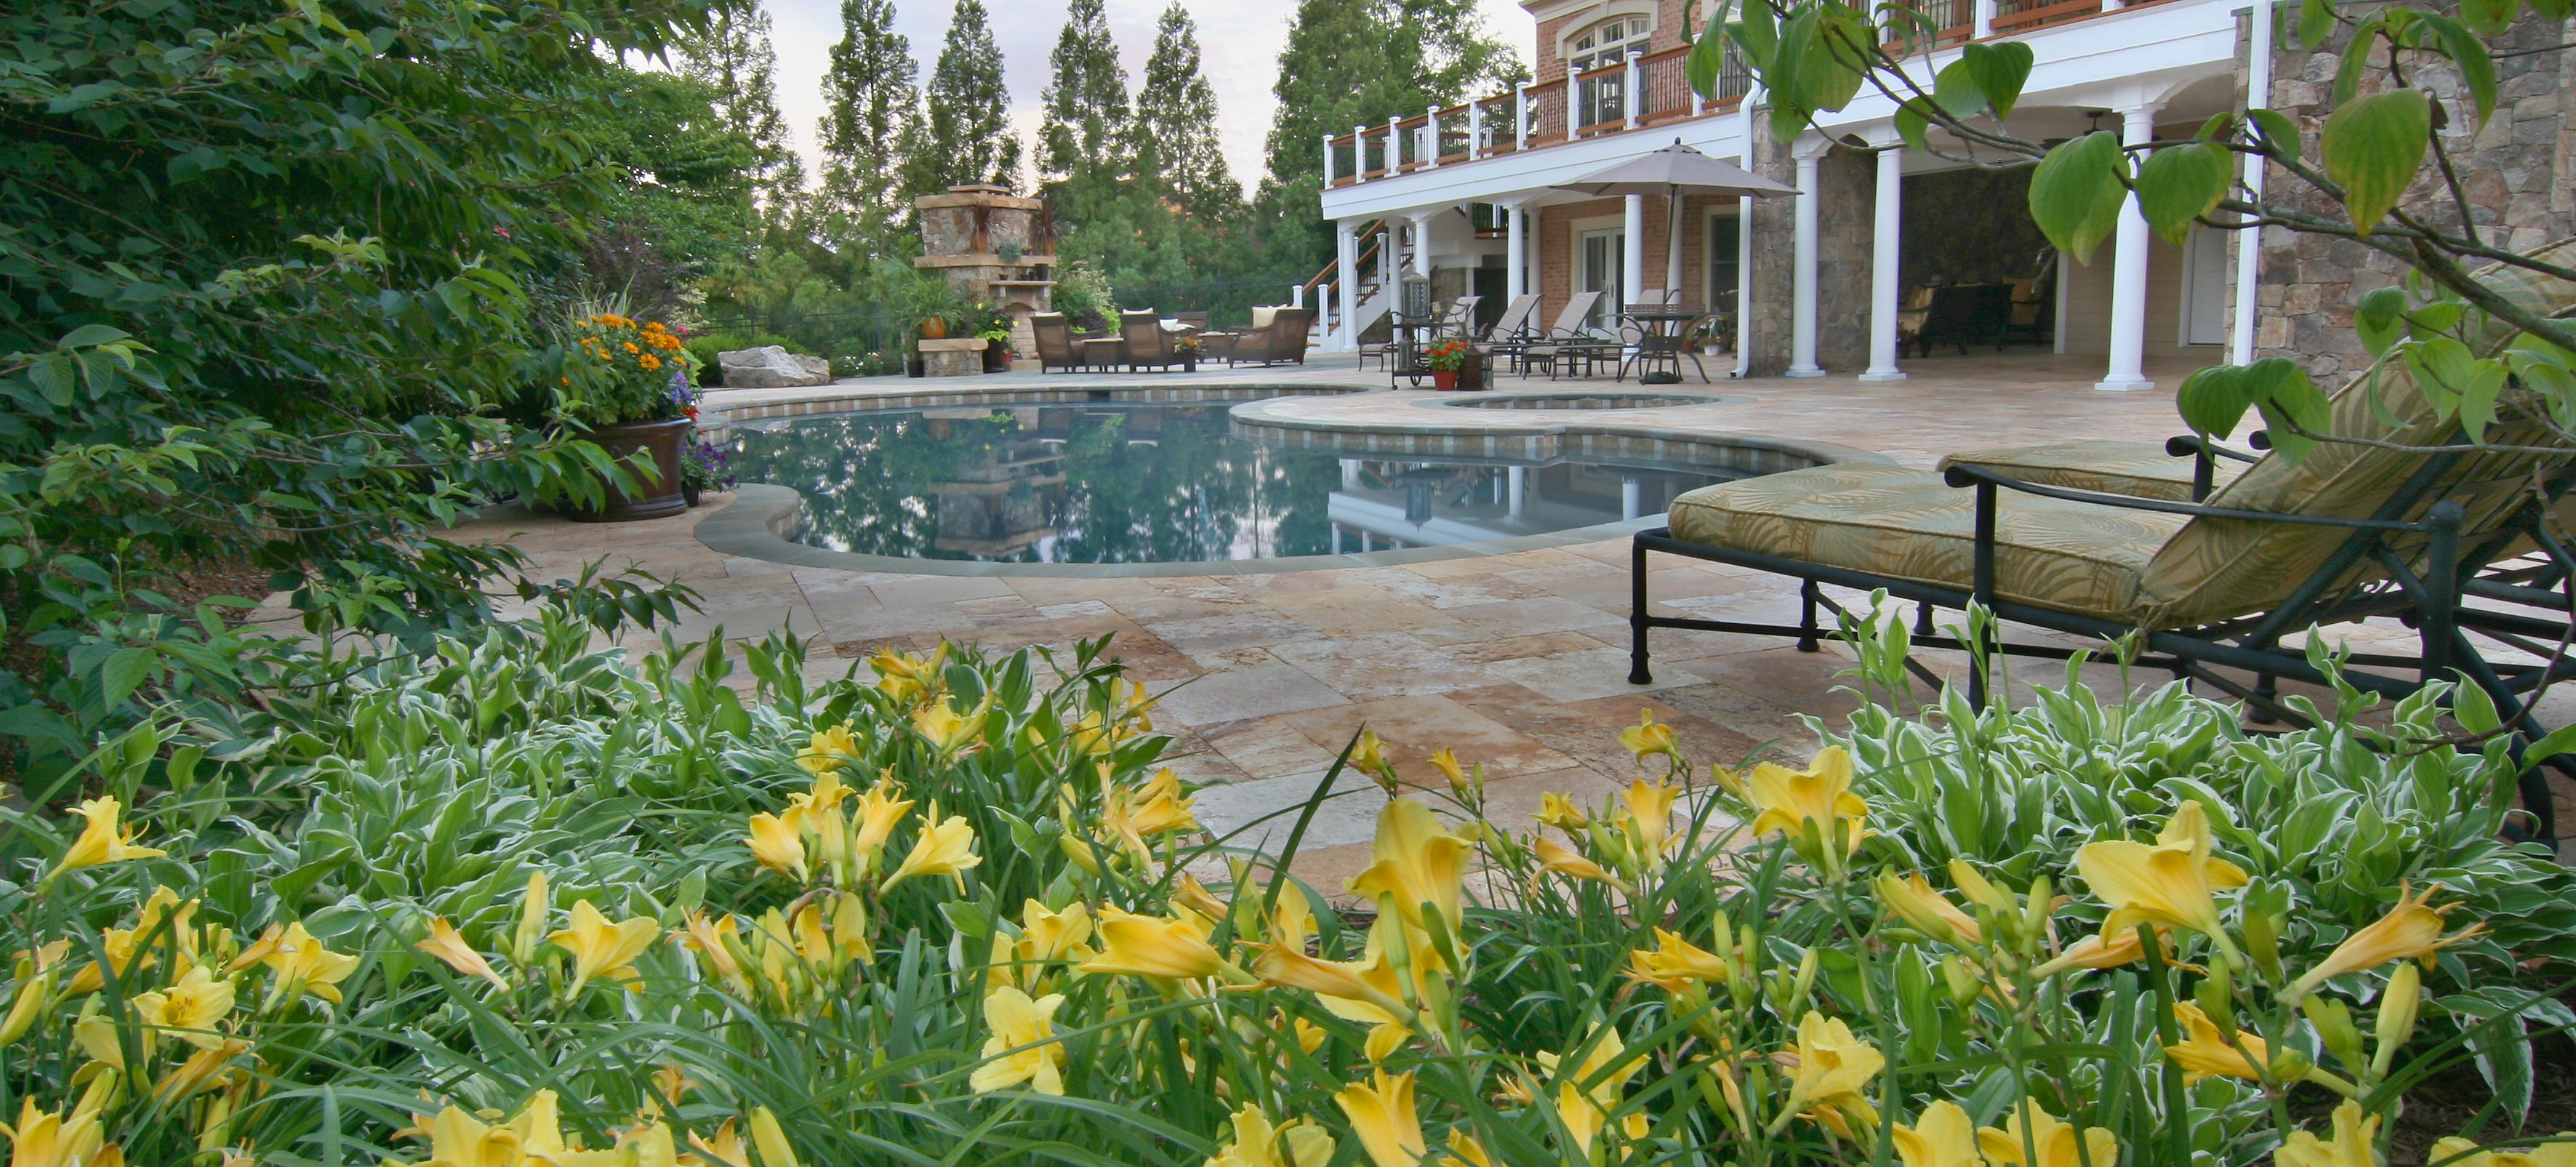 Pool with Slate Deck